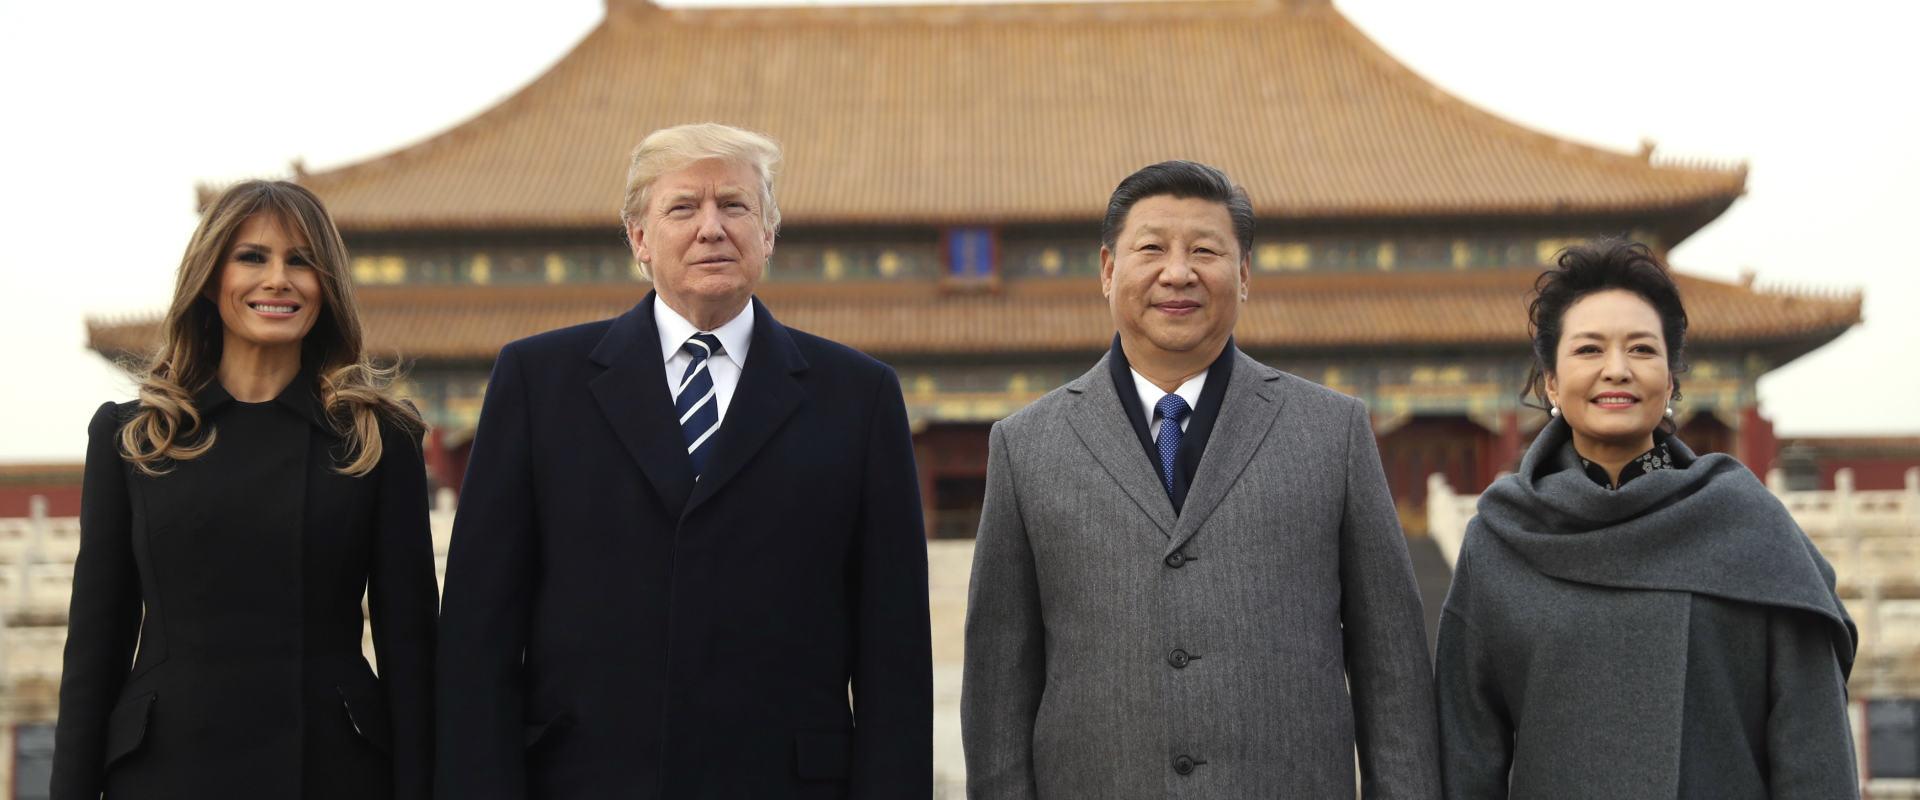 "נשיא ארה""ב טרמאפ, לצד נשיא סין, שי ג'ינפינג"